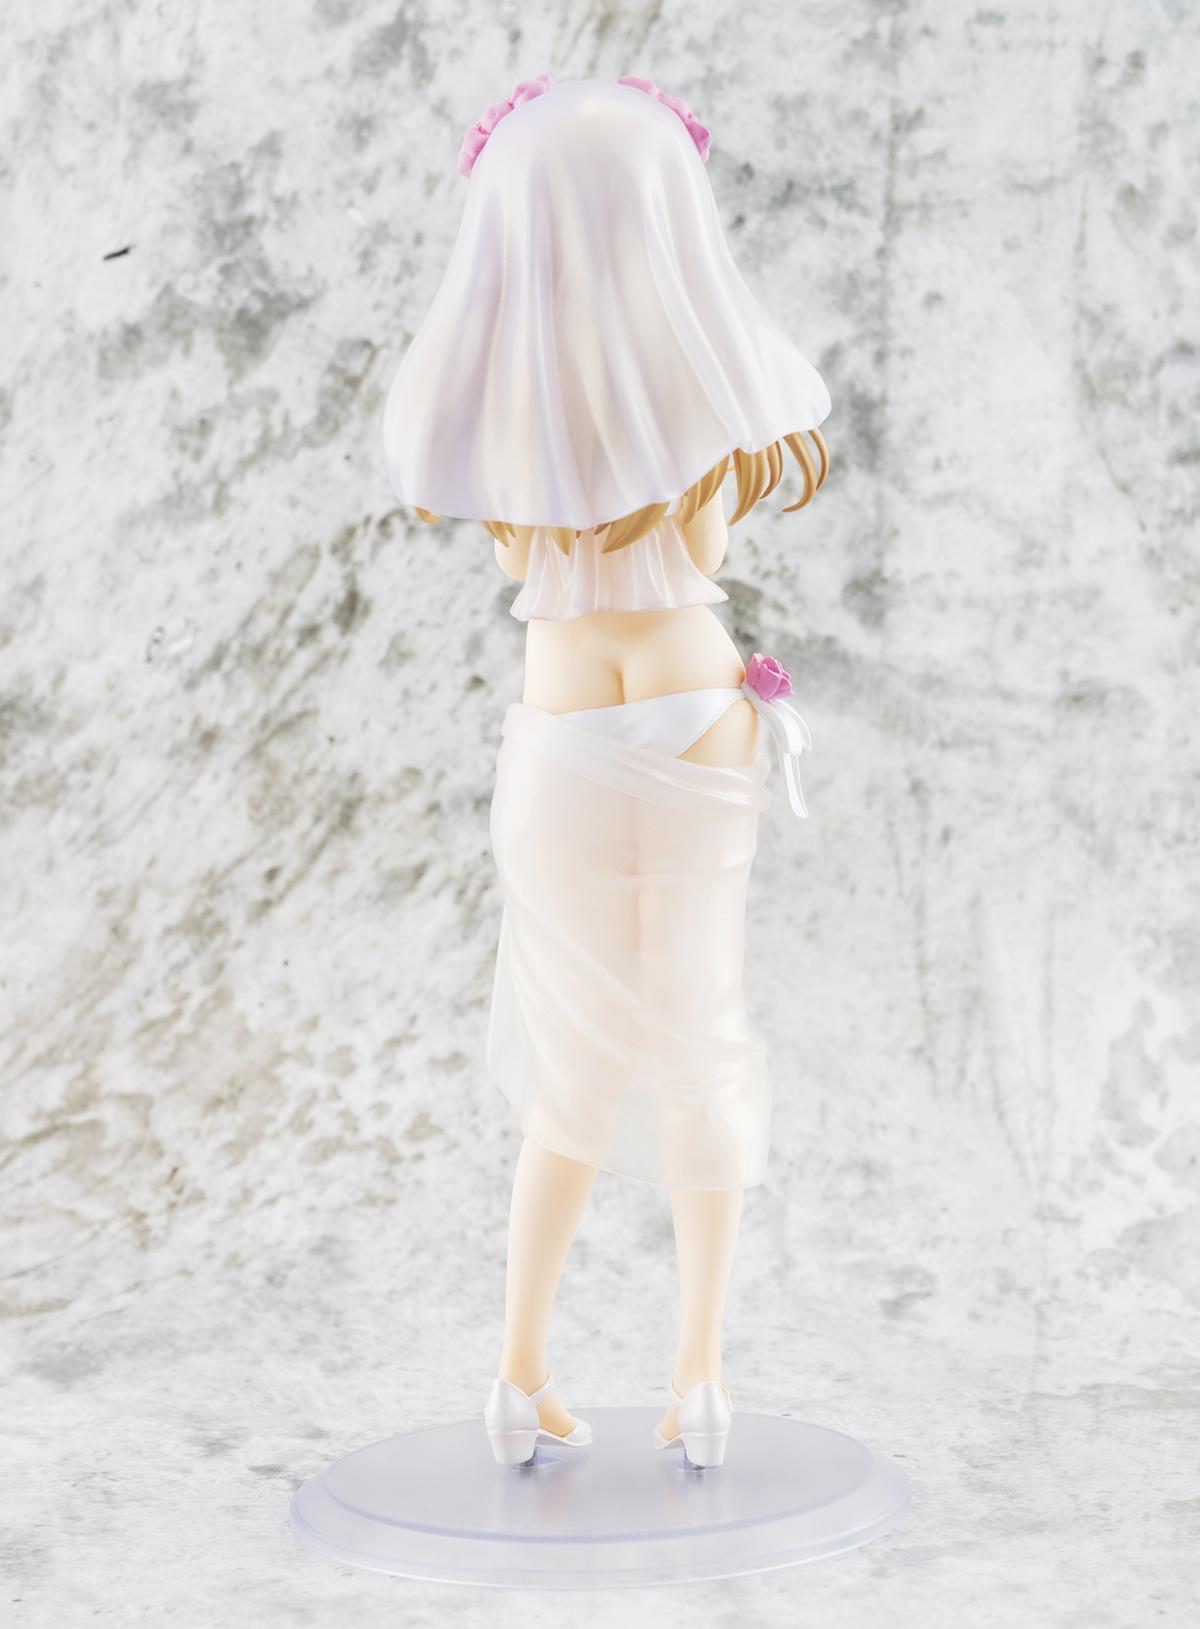 KDcolle Fate/kaleid liner Prisma☆Illyaプリズマ☆ファンタズム イリヤスフィール・フォン・アインツベルン ウェディングビキニVer. 1/7